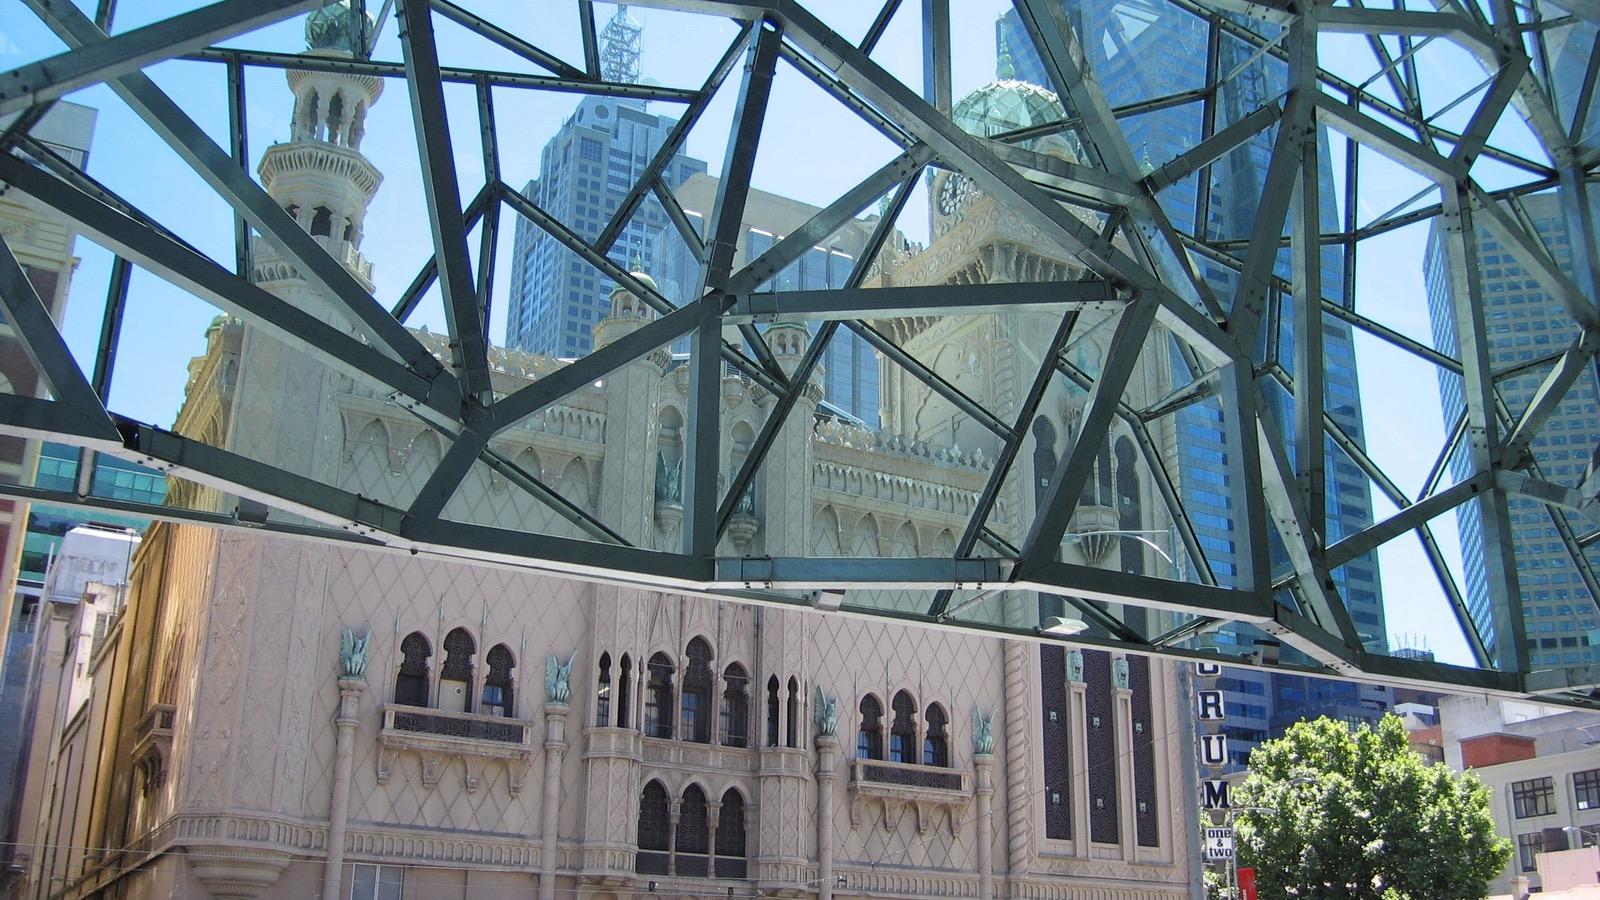 Melbourne, diversity in Architecture